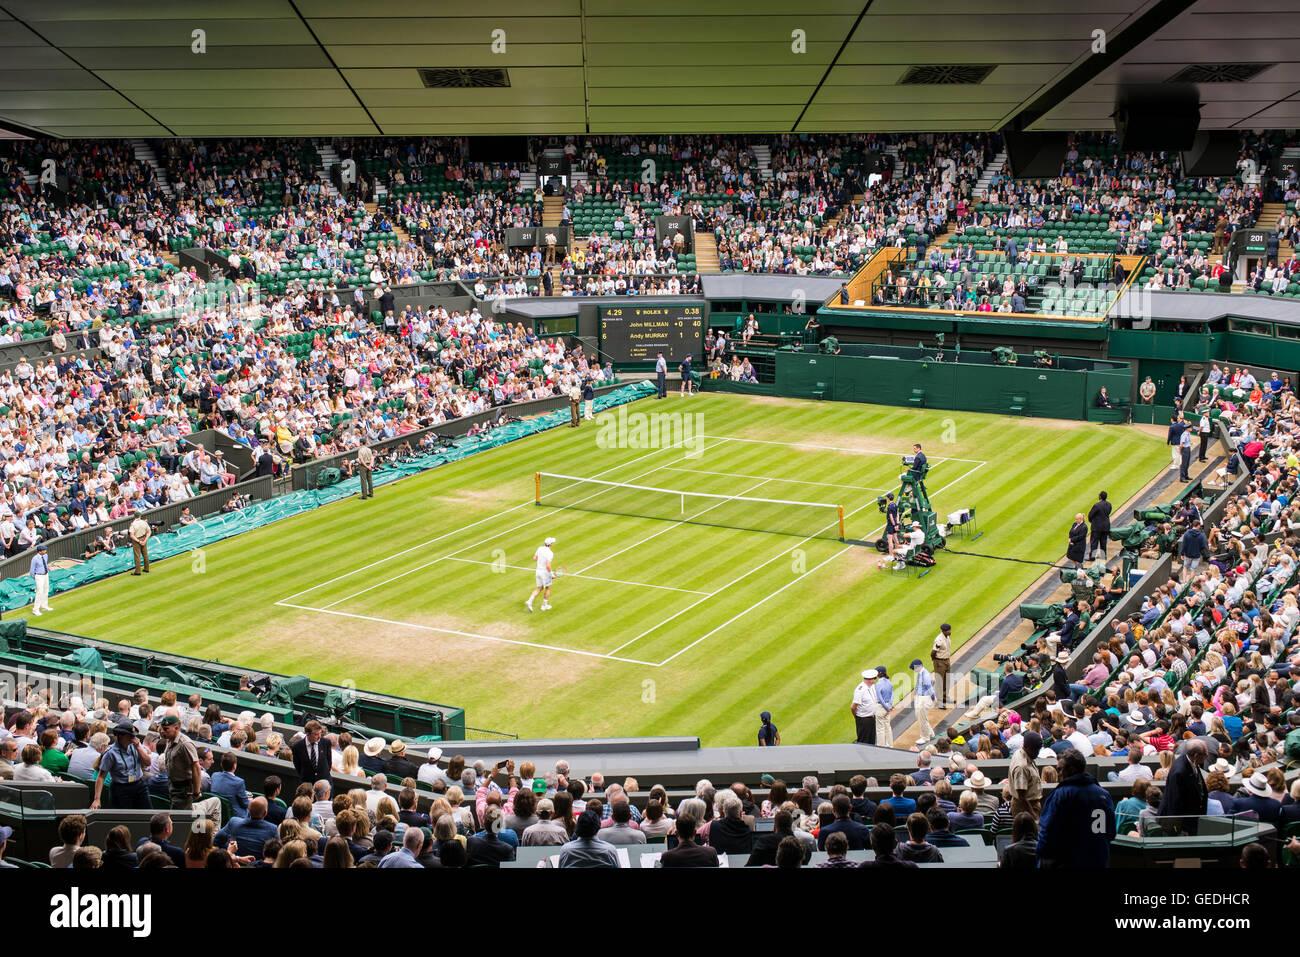 how many spectators at centre court wimbledon